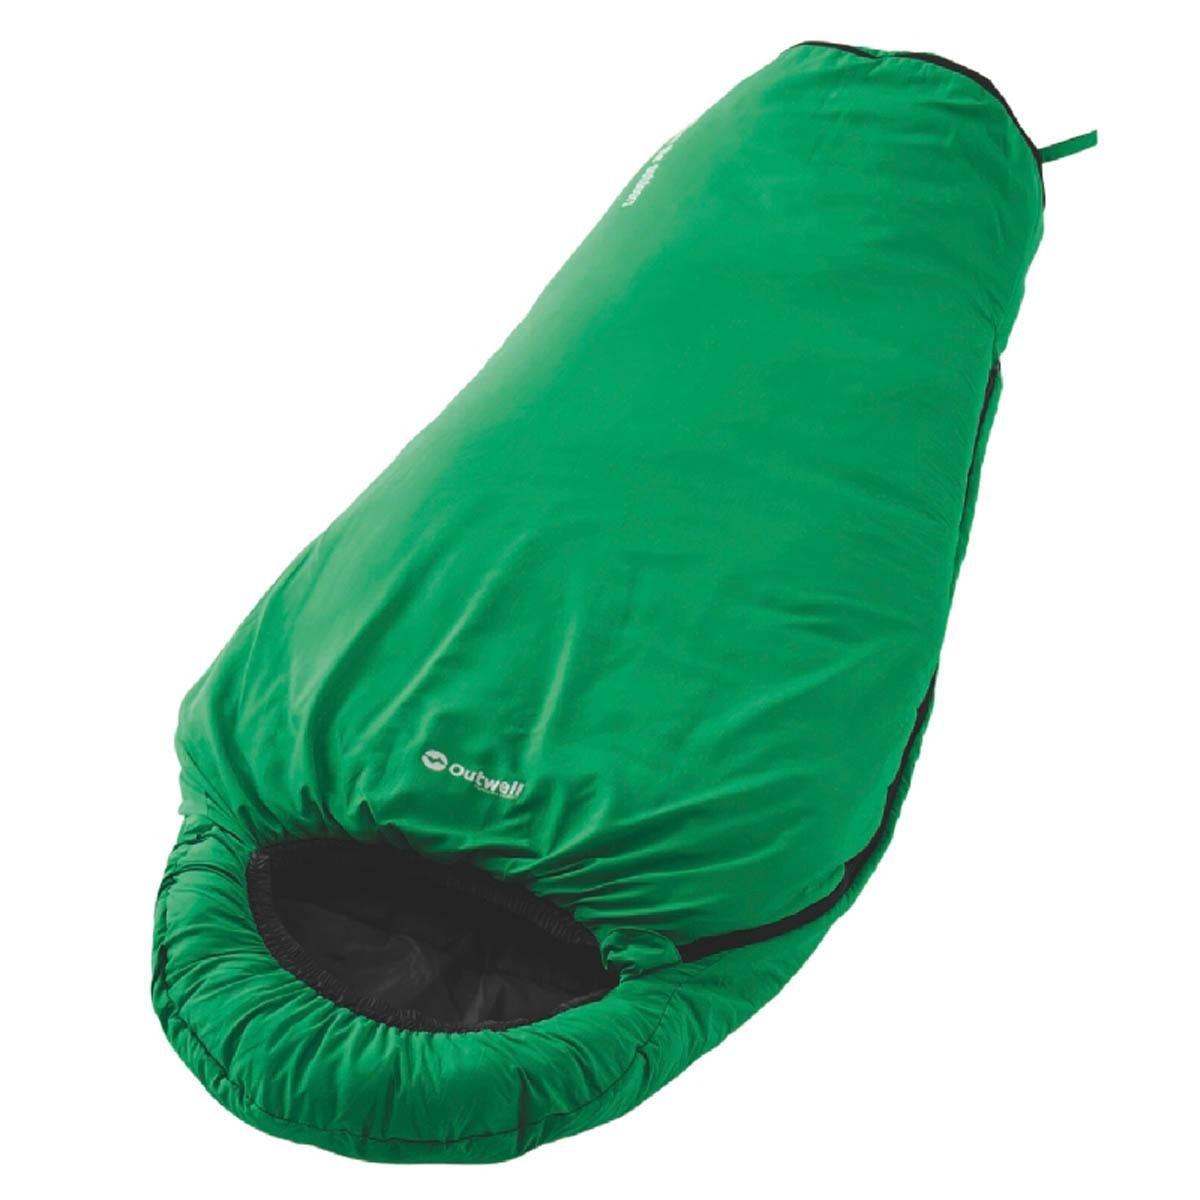 Outwell Saco de dormir infantil Convertible Junior Verde verde Talla:140 cm / 170 cm: Amazon.es: Deportes y aire libre